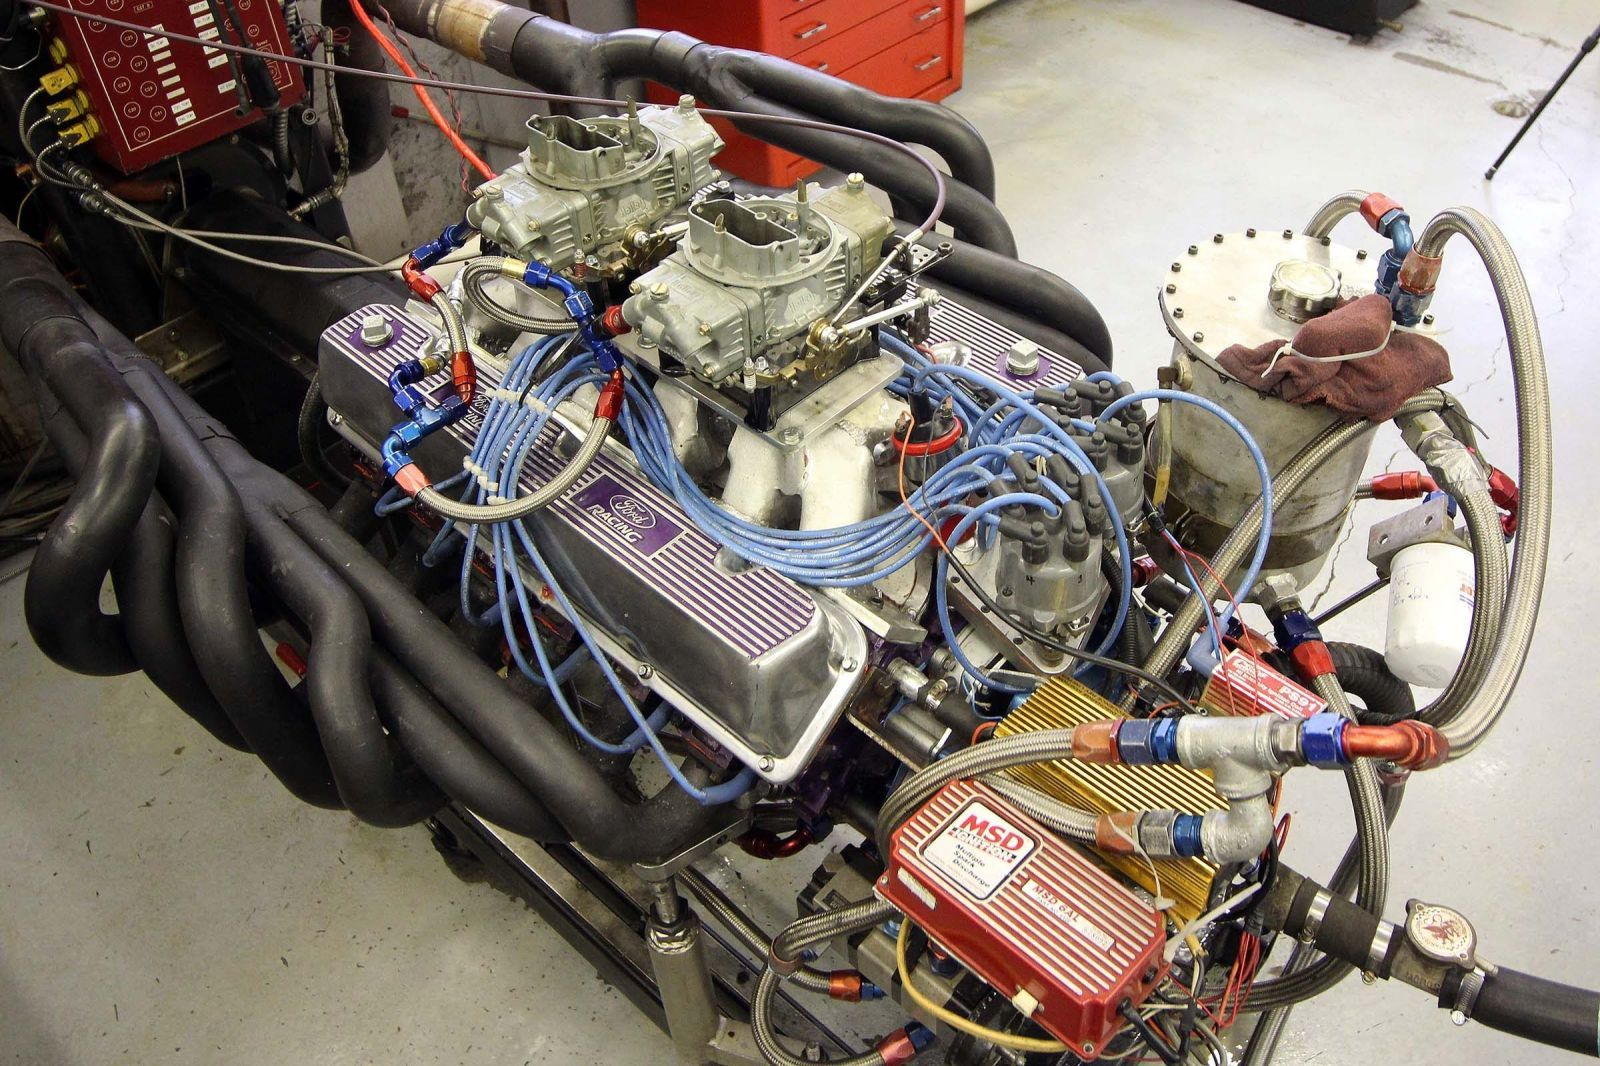 Watch This Madman Build a 697-Hp Ford V-12  - PopularMechanics.com